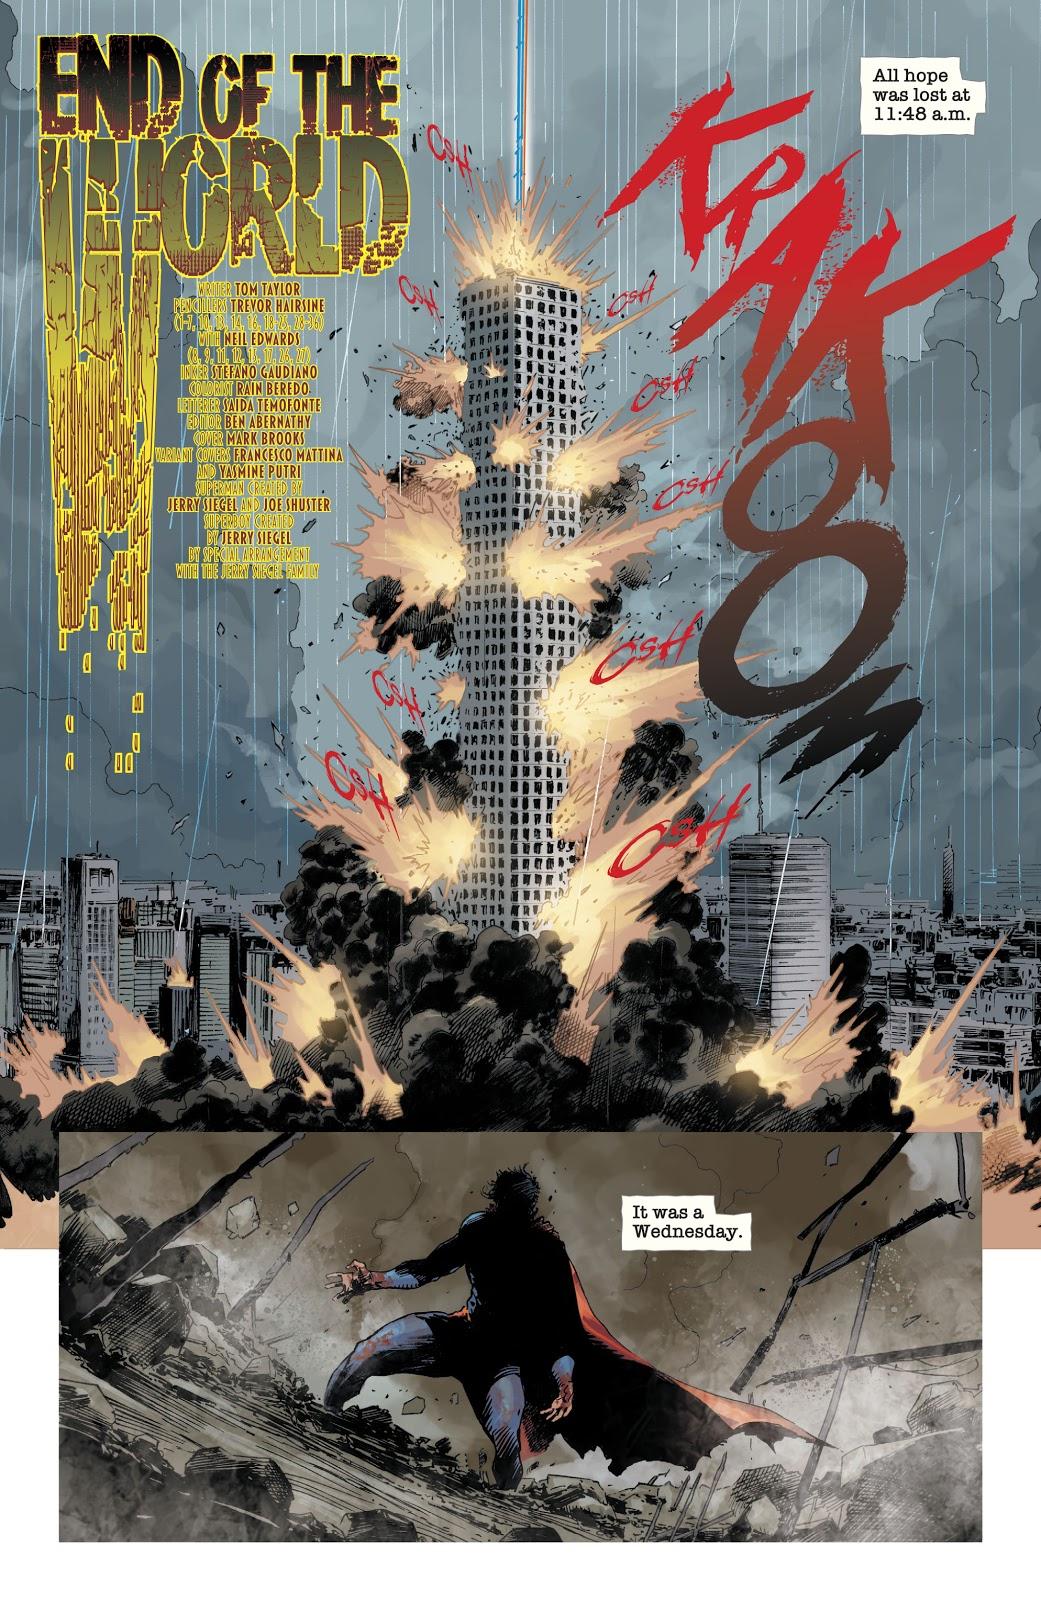 Zombie Superman (DCeased #6)